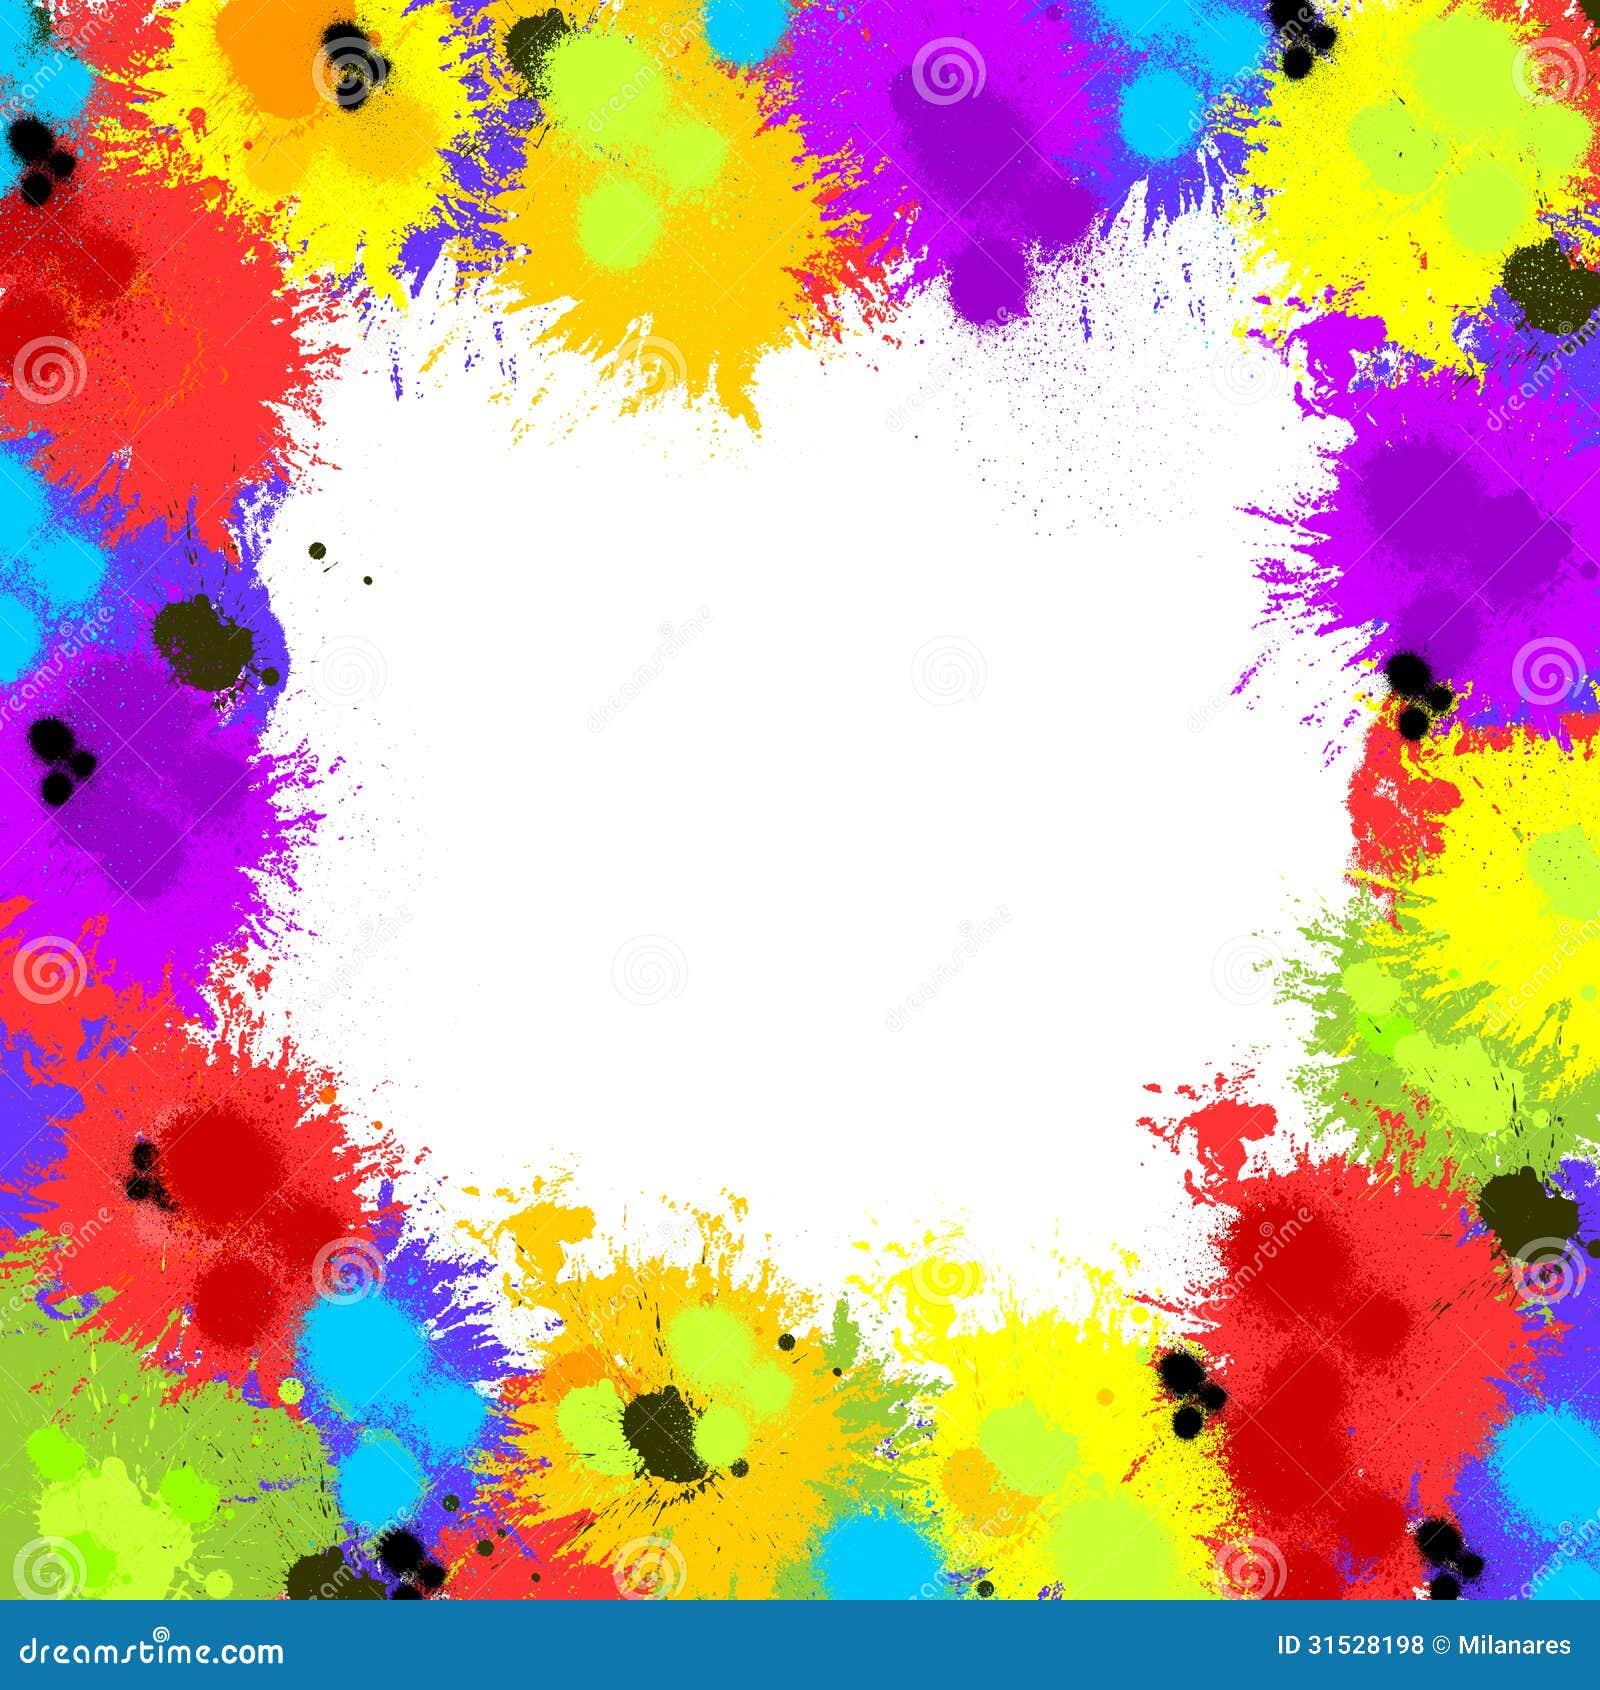 Colorful Inky Splash Frame Border Royalty Free Stock